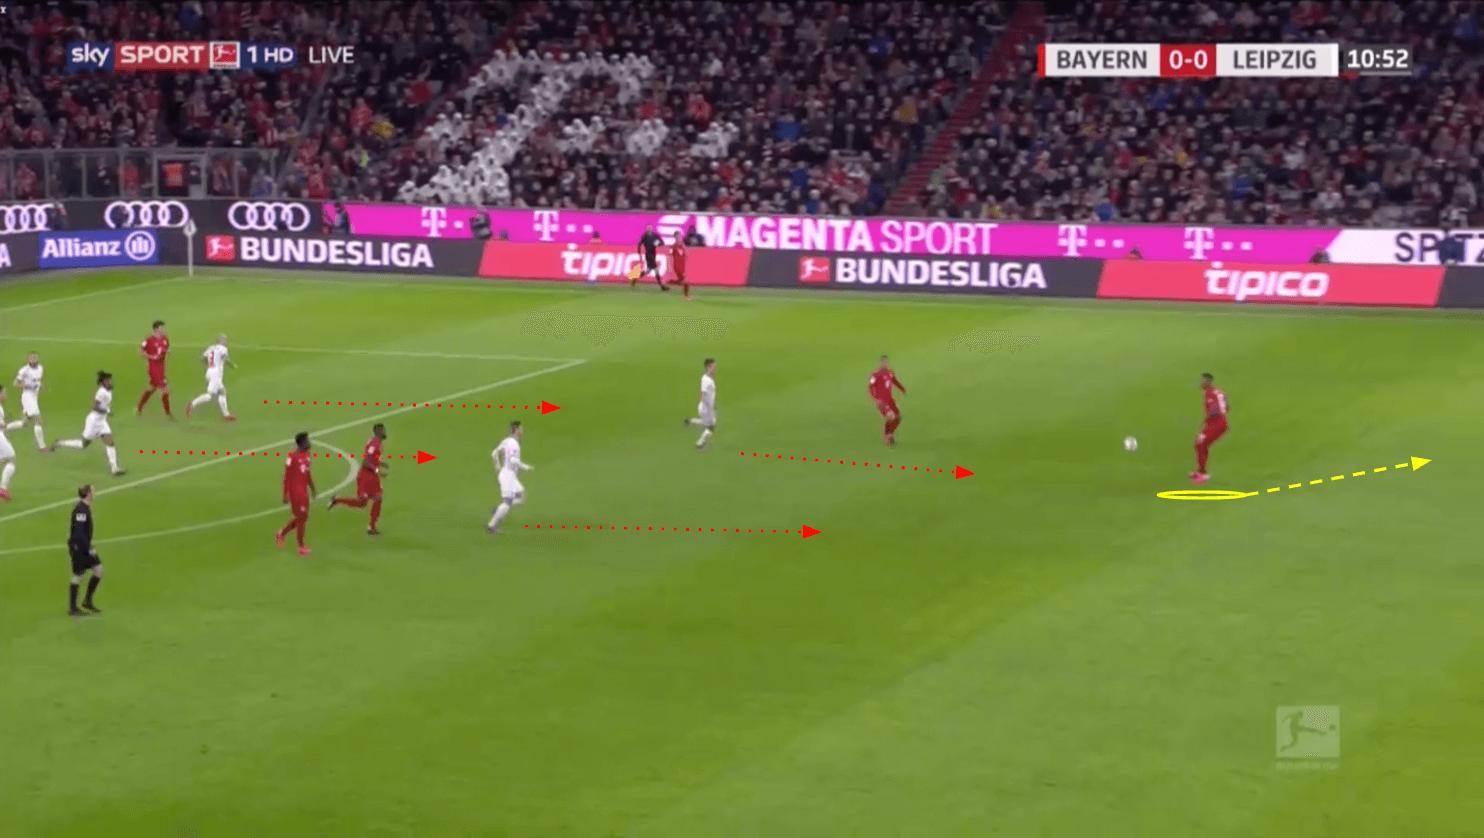 Jérôme Boateng 2019/20 - scout report - tactical analysis - tactics